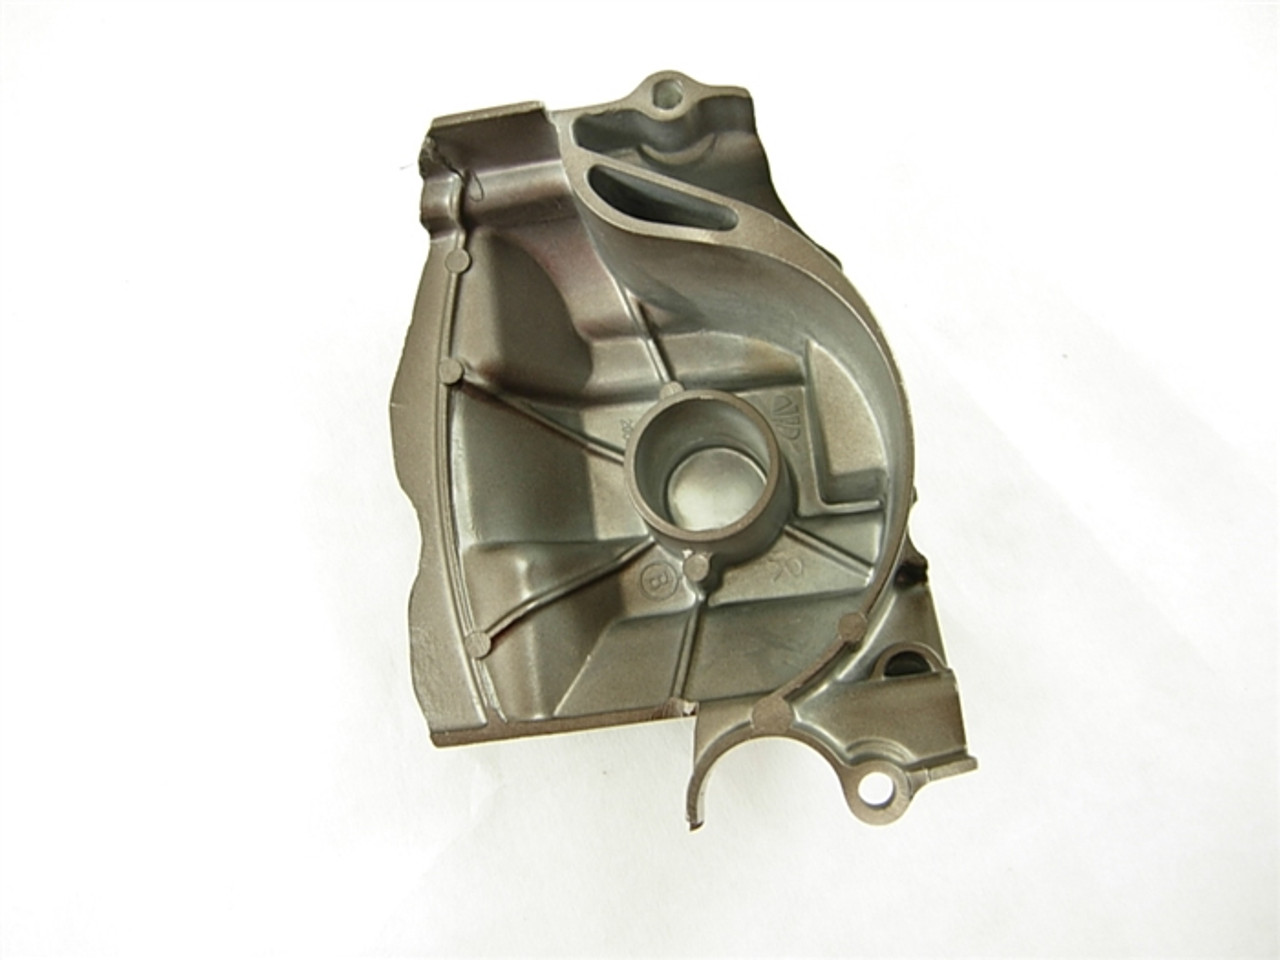 engine sprocket cover 12948-a164-14